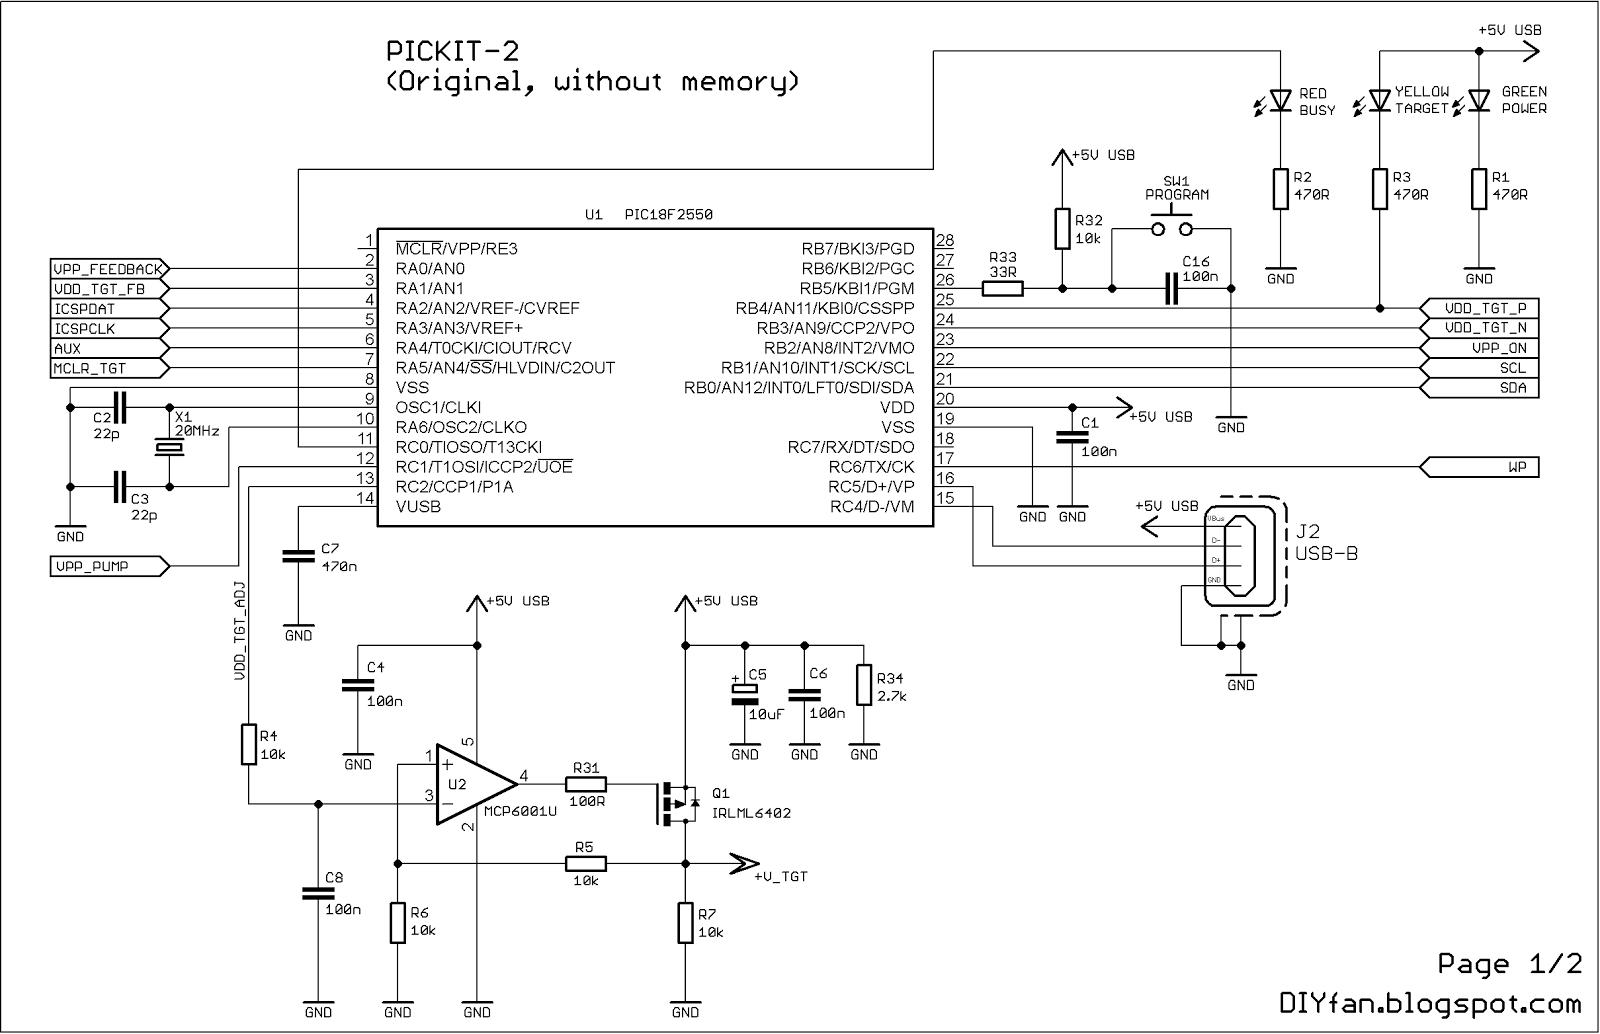 pickit 2 programmer circuit diagram 2005 dodge durango infinity stereo wiring diyfan original